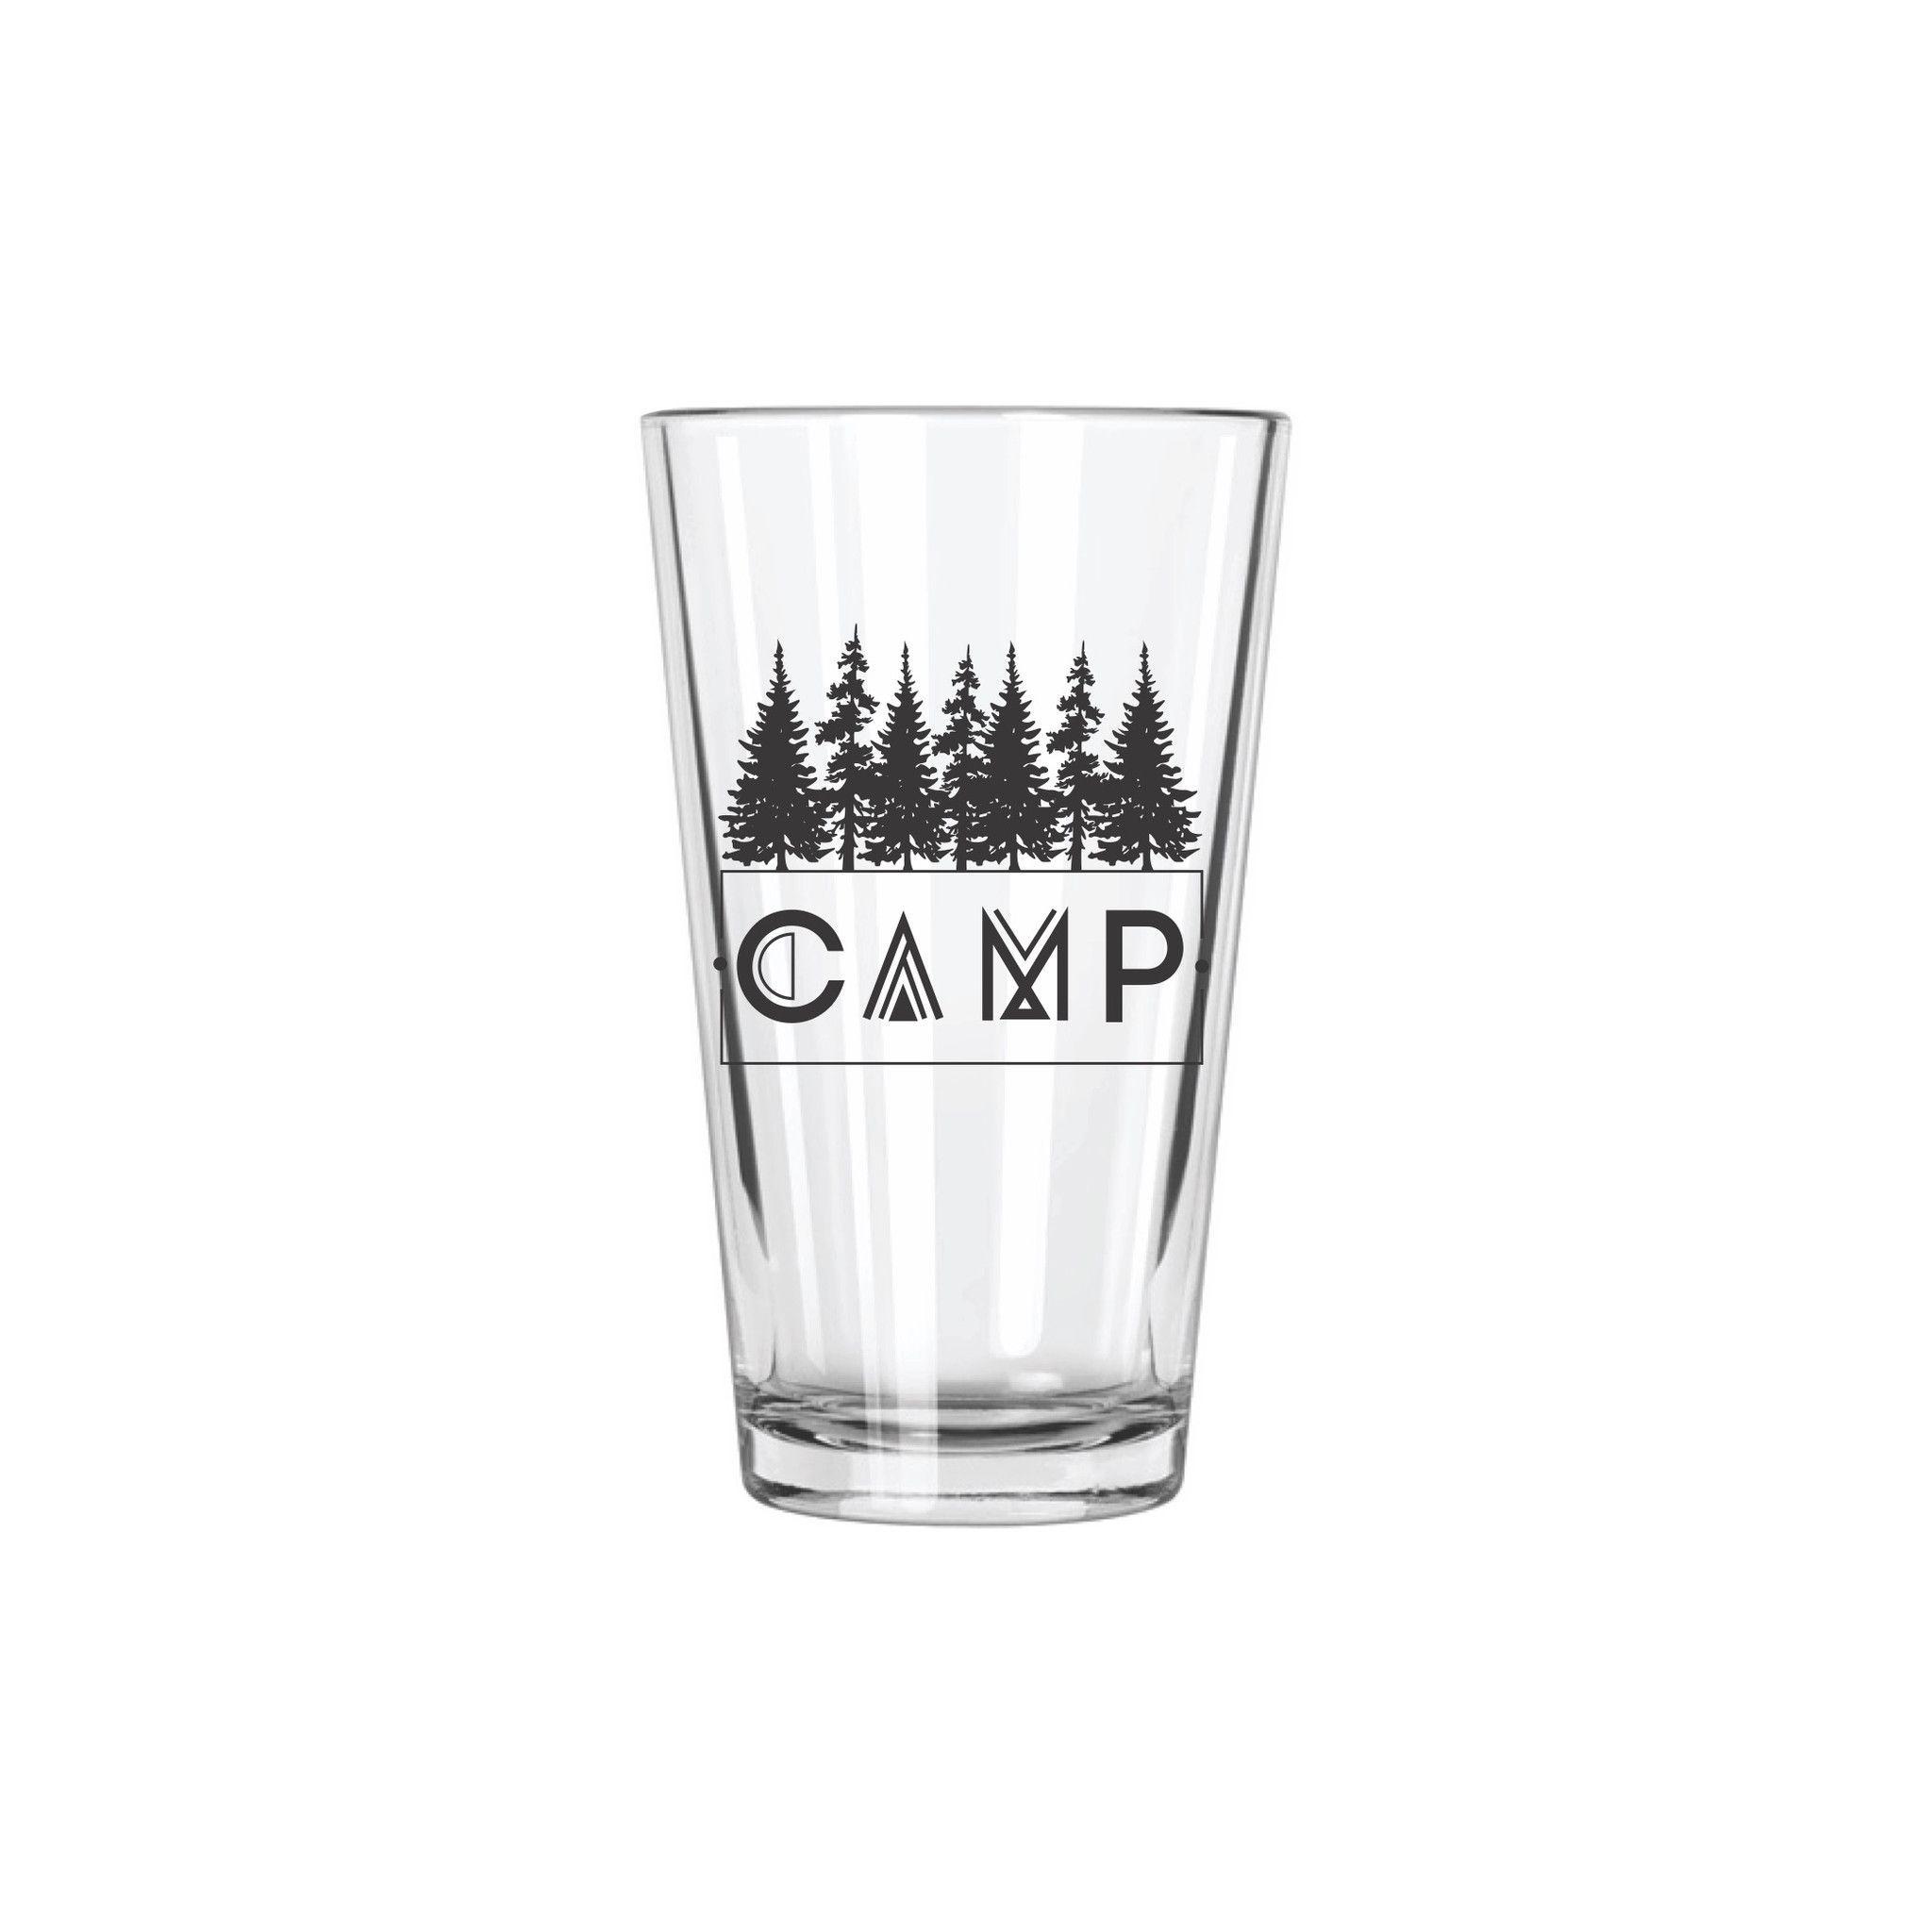 b3c61c287ce Camp Pint Glass   SHOP Home Decor + Design   Glass, Pint glass, Safe ...